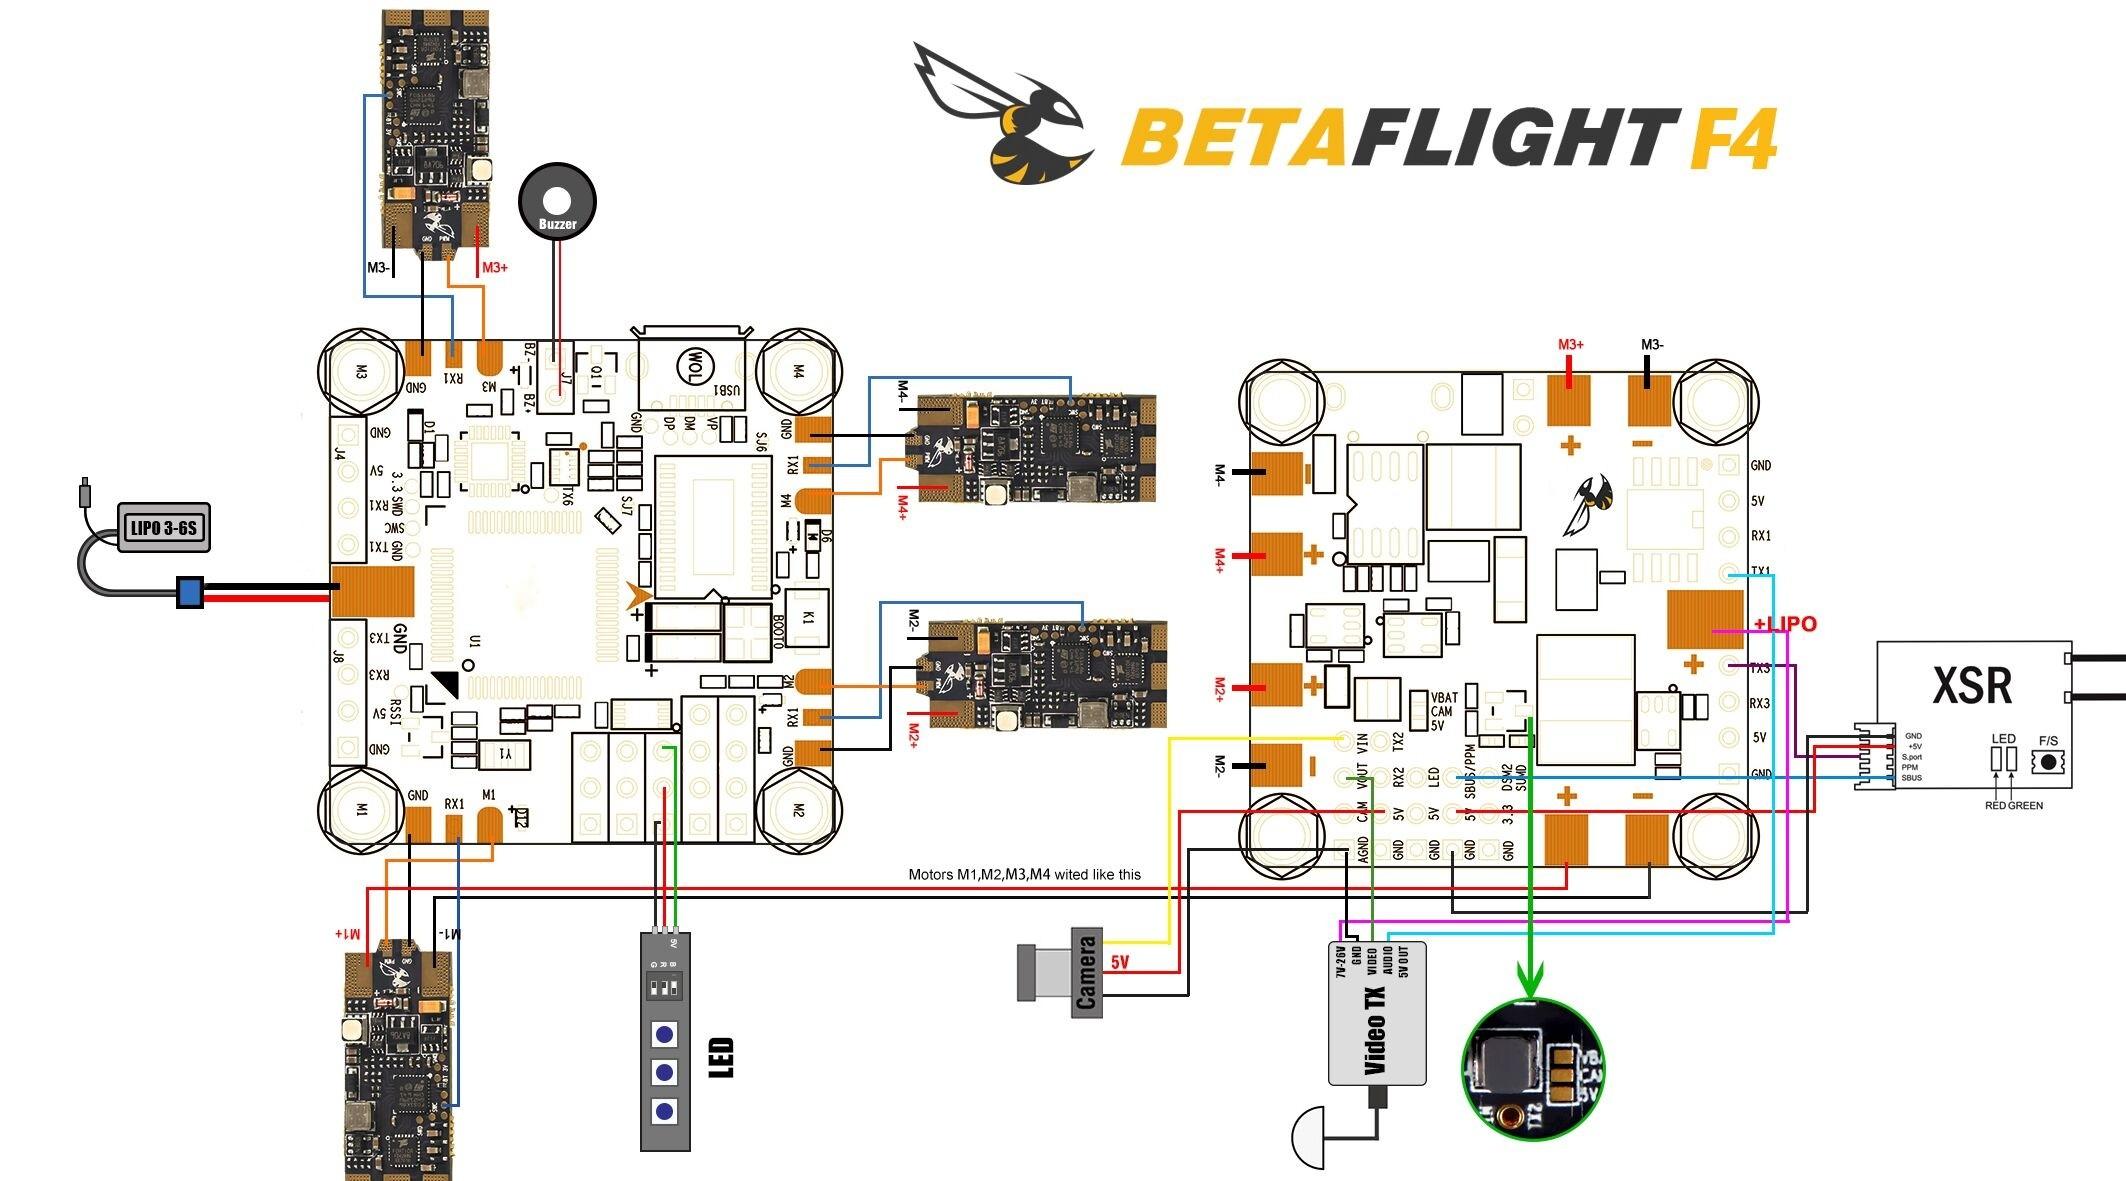 Betaflight F4 FC - Wiring Diagram